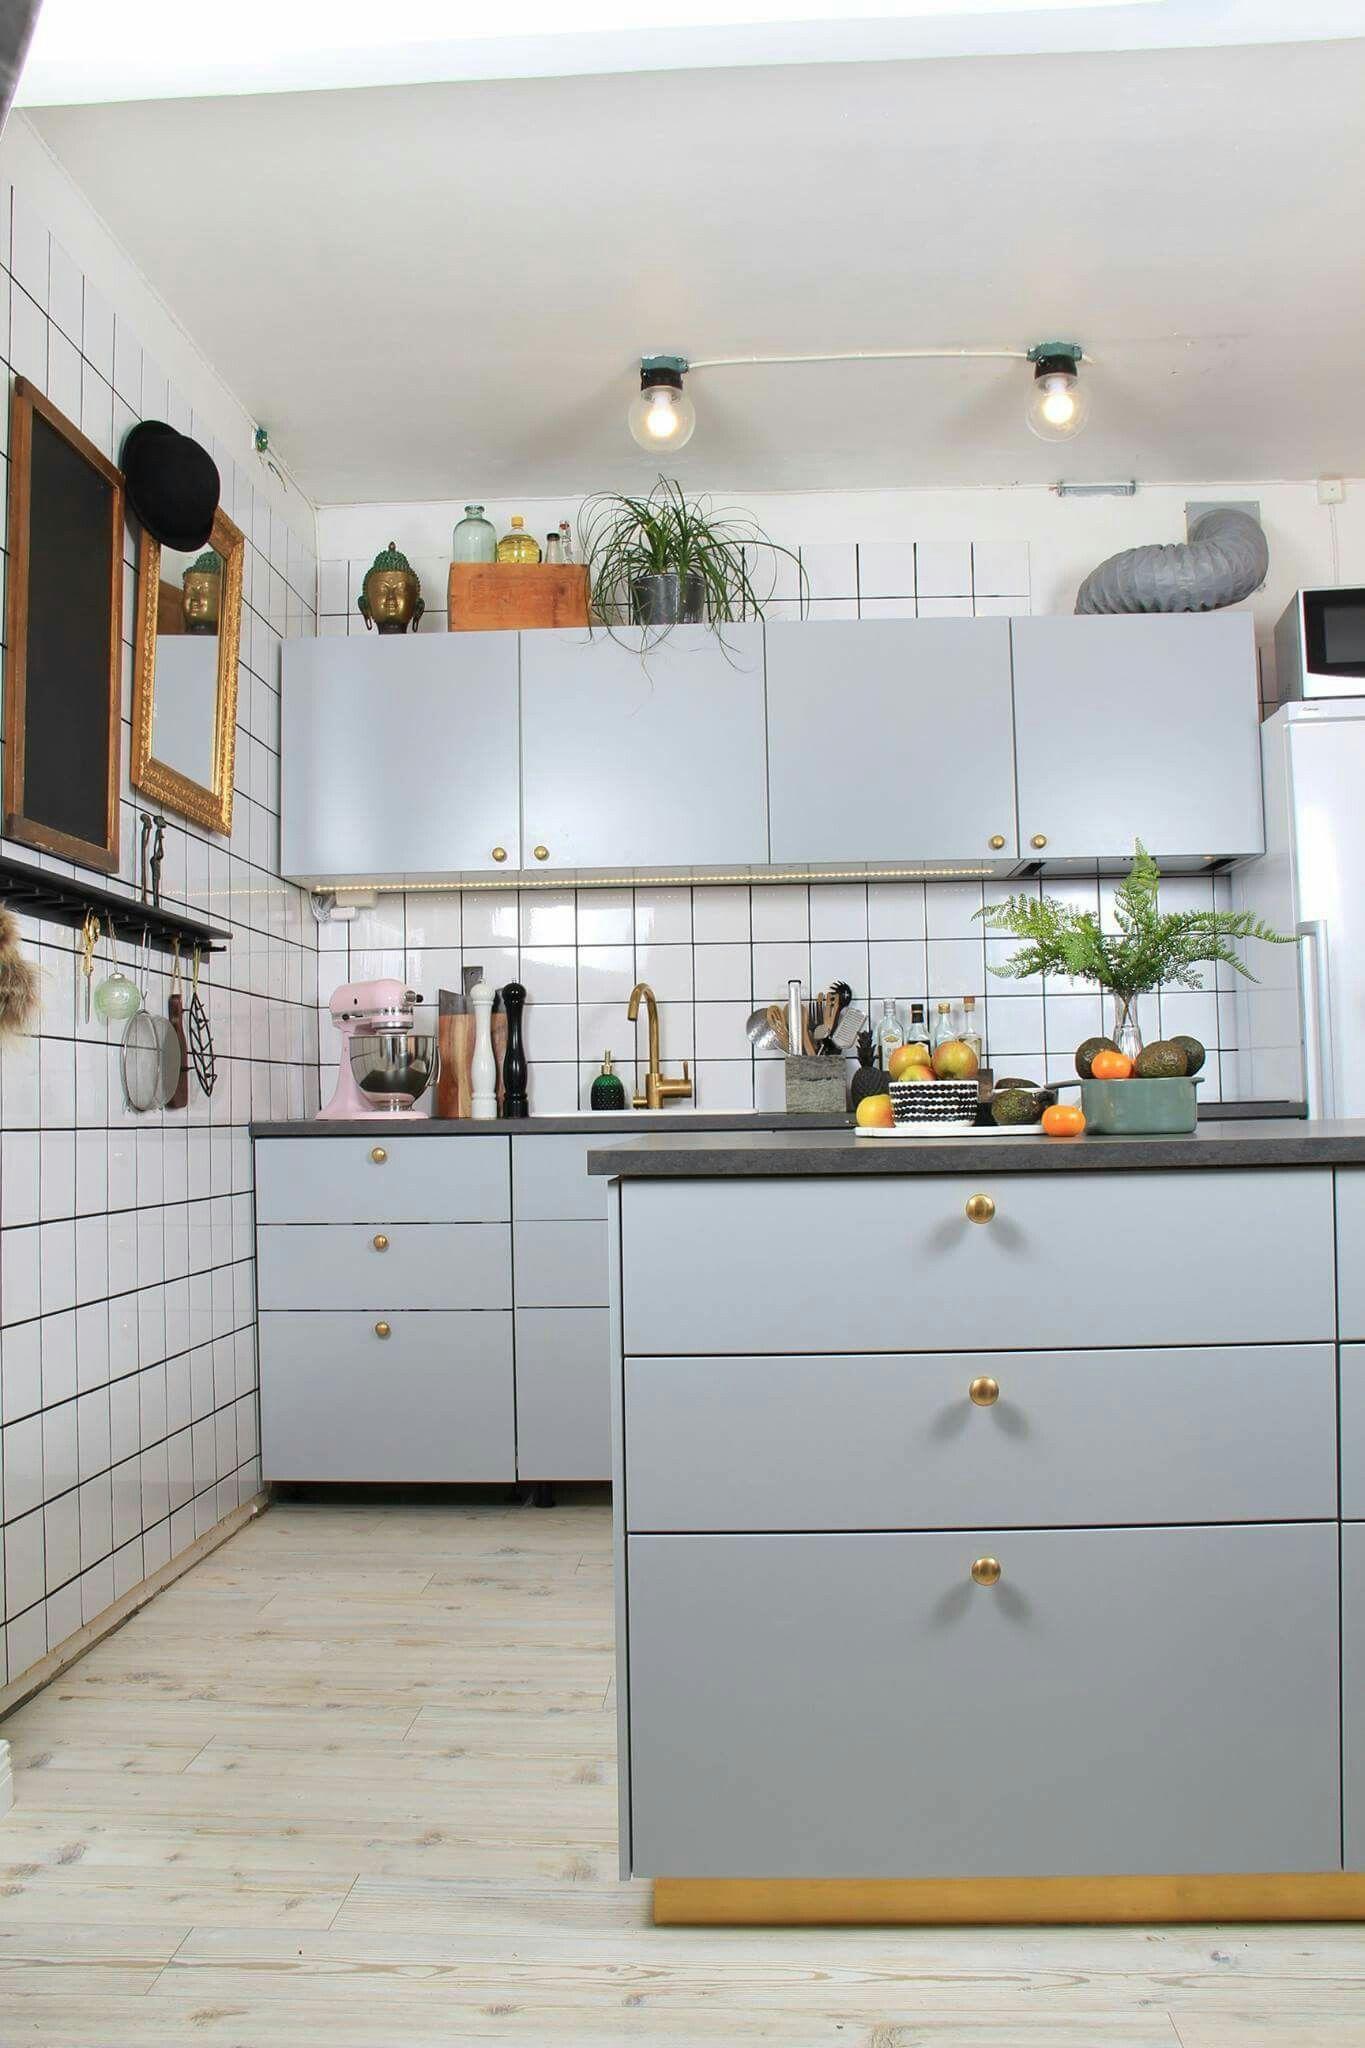 Ikea Kitchen Veddinge Gra Jursla Kok Pinterest Minimalist Home Furniture Minimalist Home Decor Minimalist Kitchen Design